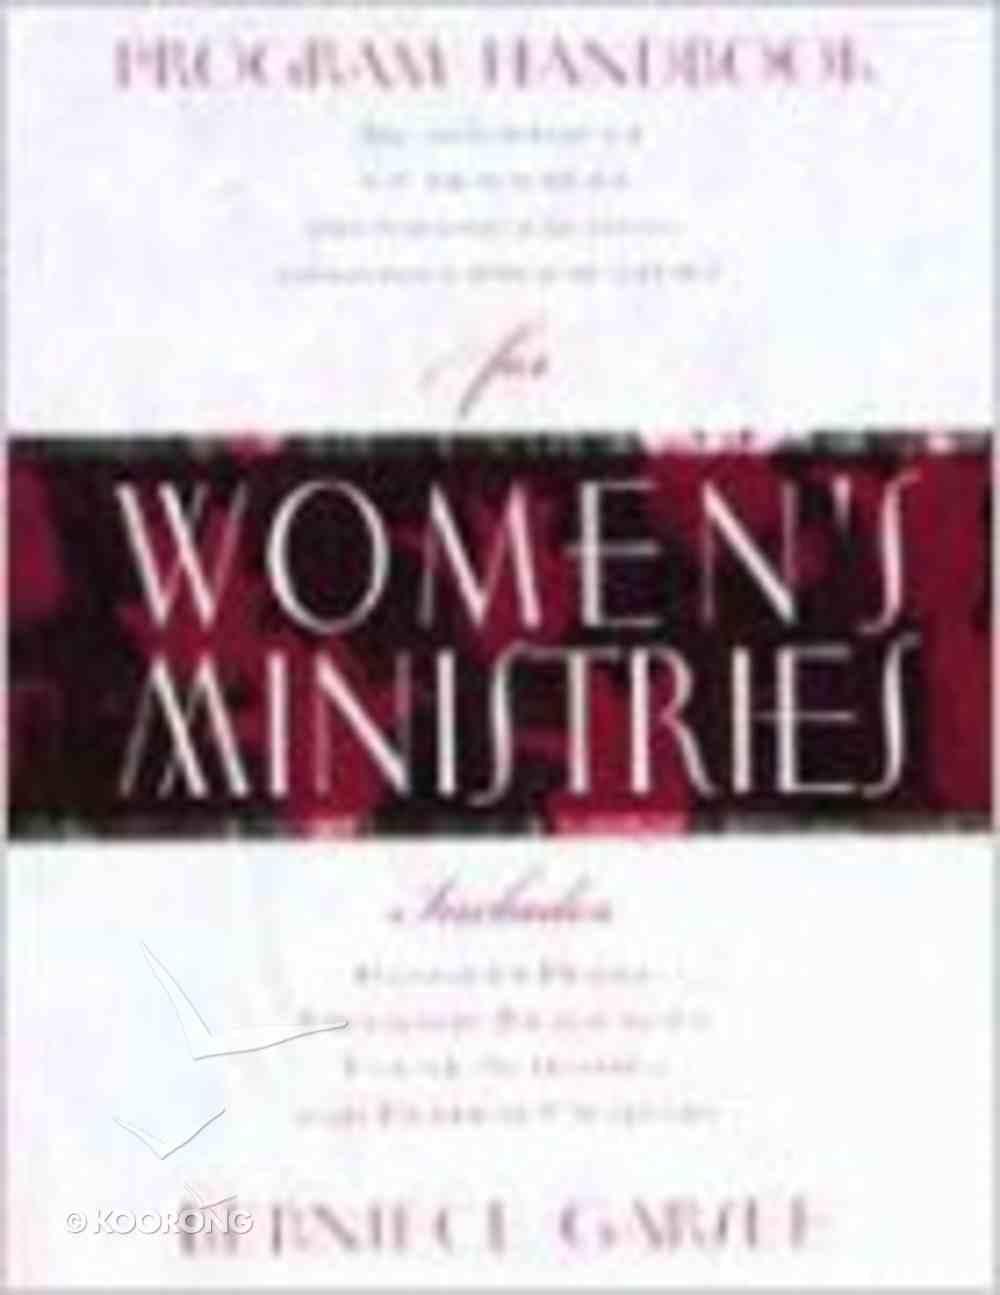 Program Handbook For Women's Ministries Paperback